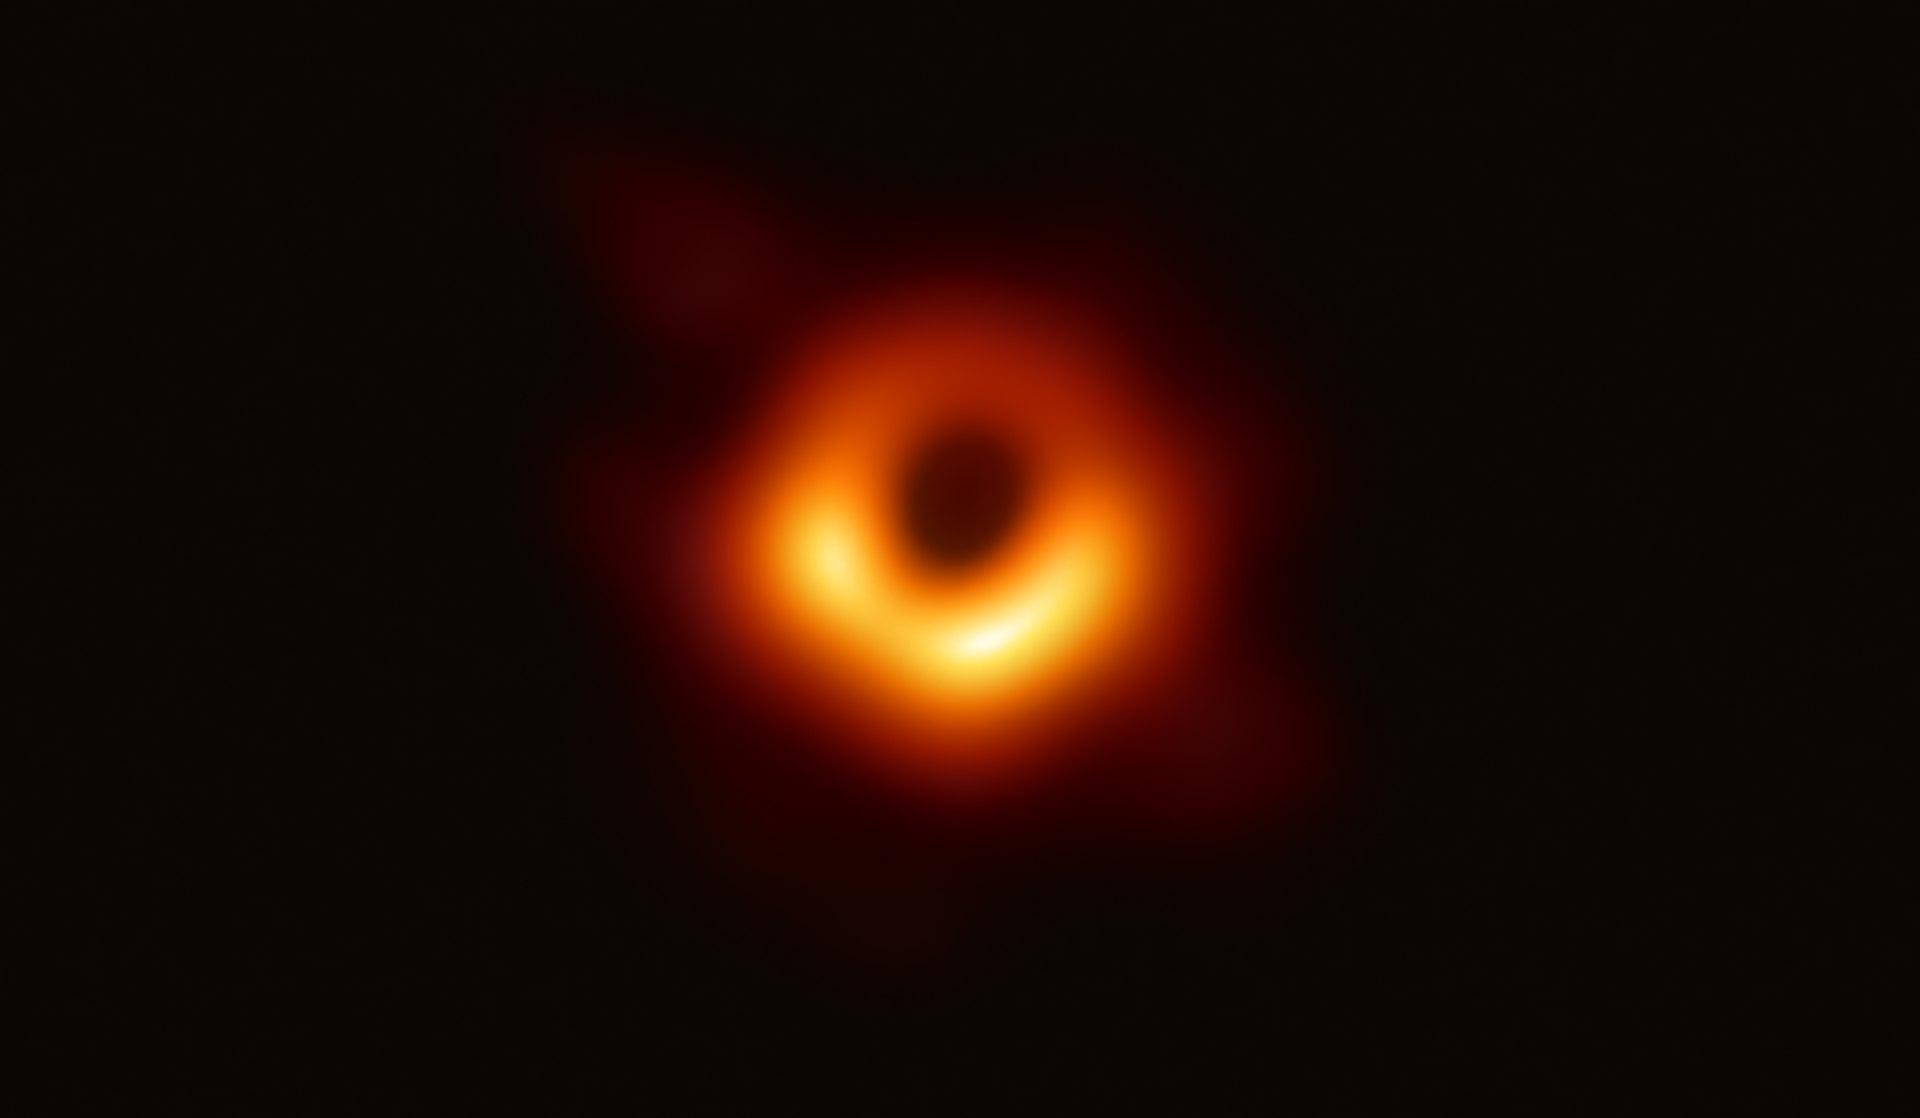 image of a black hole